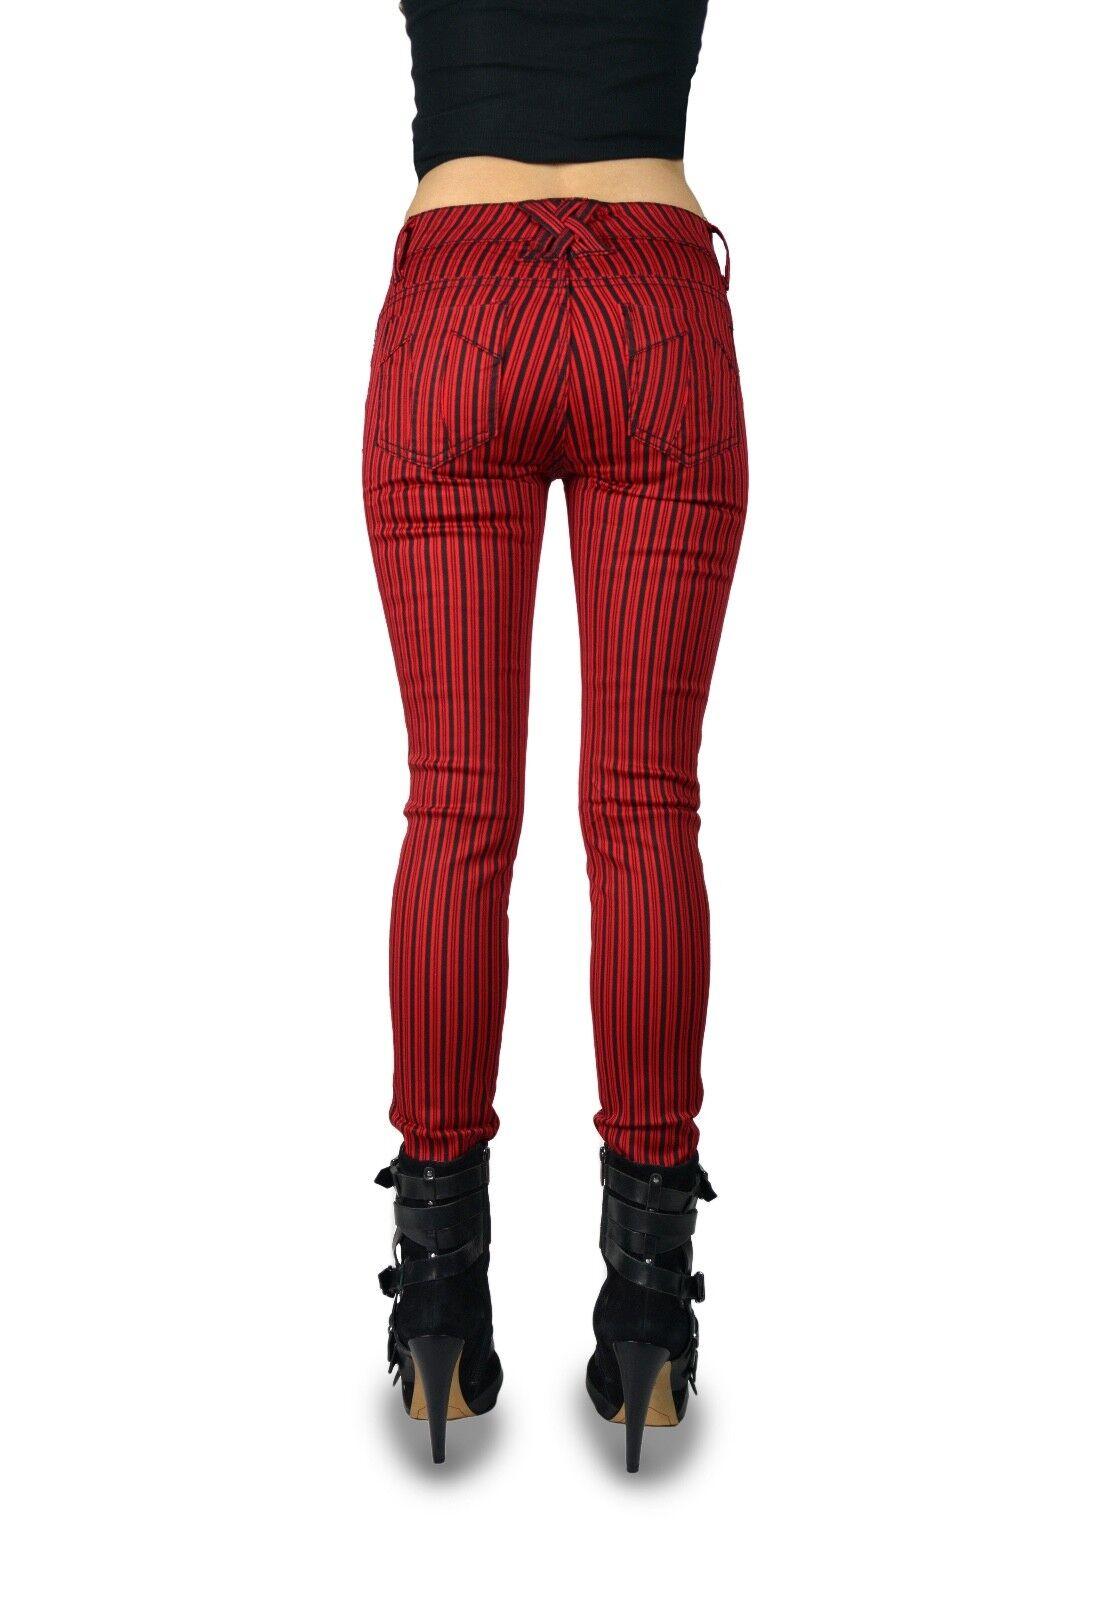 TRIPP BLACK RED RAILROAD STRIPE JEAN PANTS MOTO METAL SKINNY GOTH EMO IS6235P Clothing, Shoes & Accessories